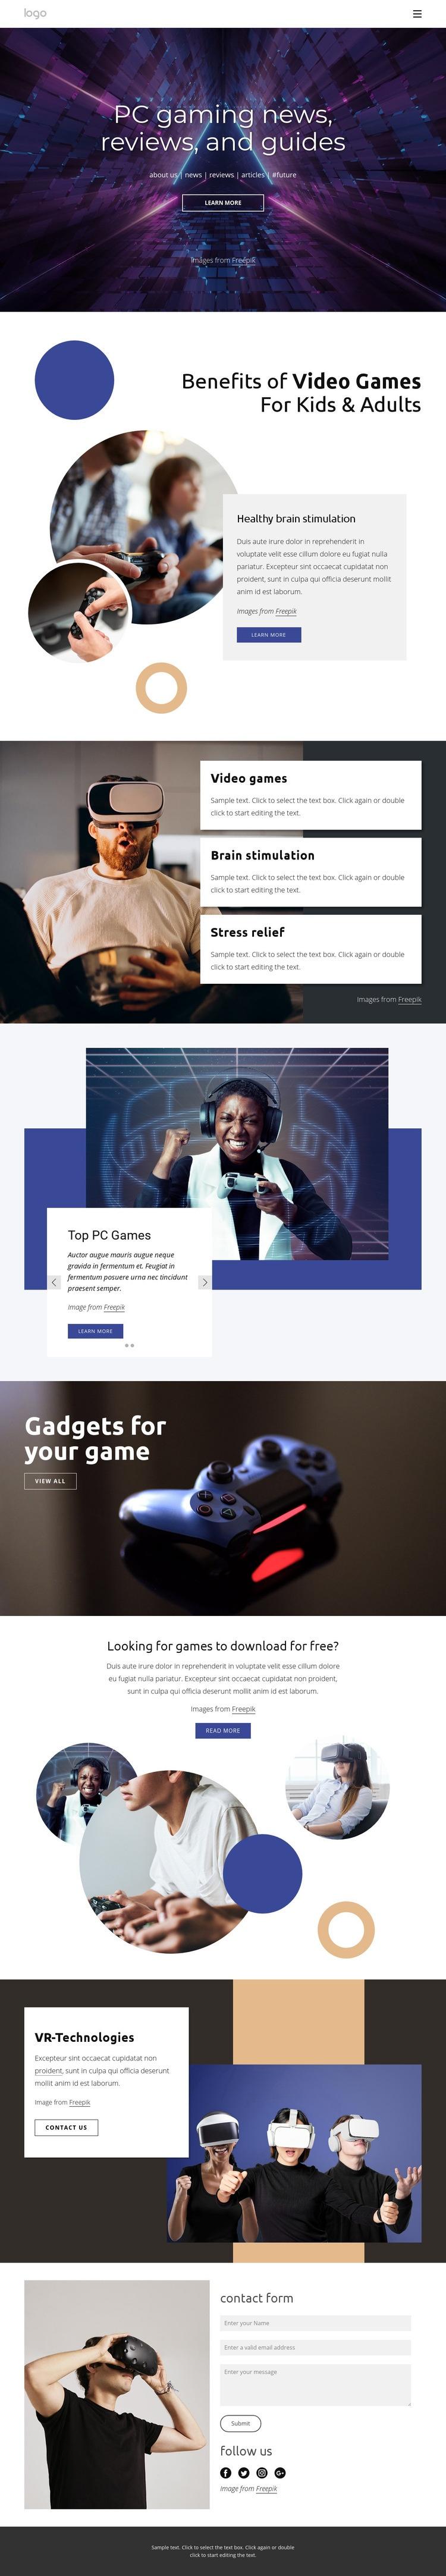 PC gaming news Homepage Design